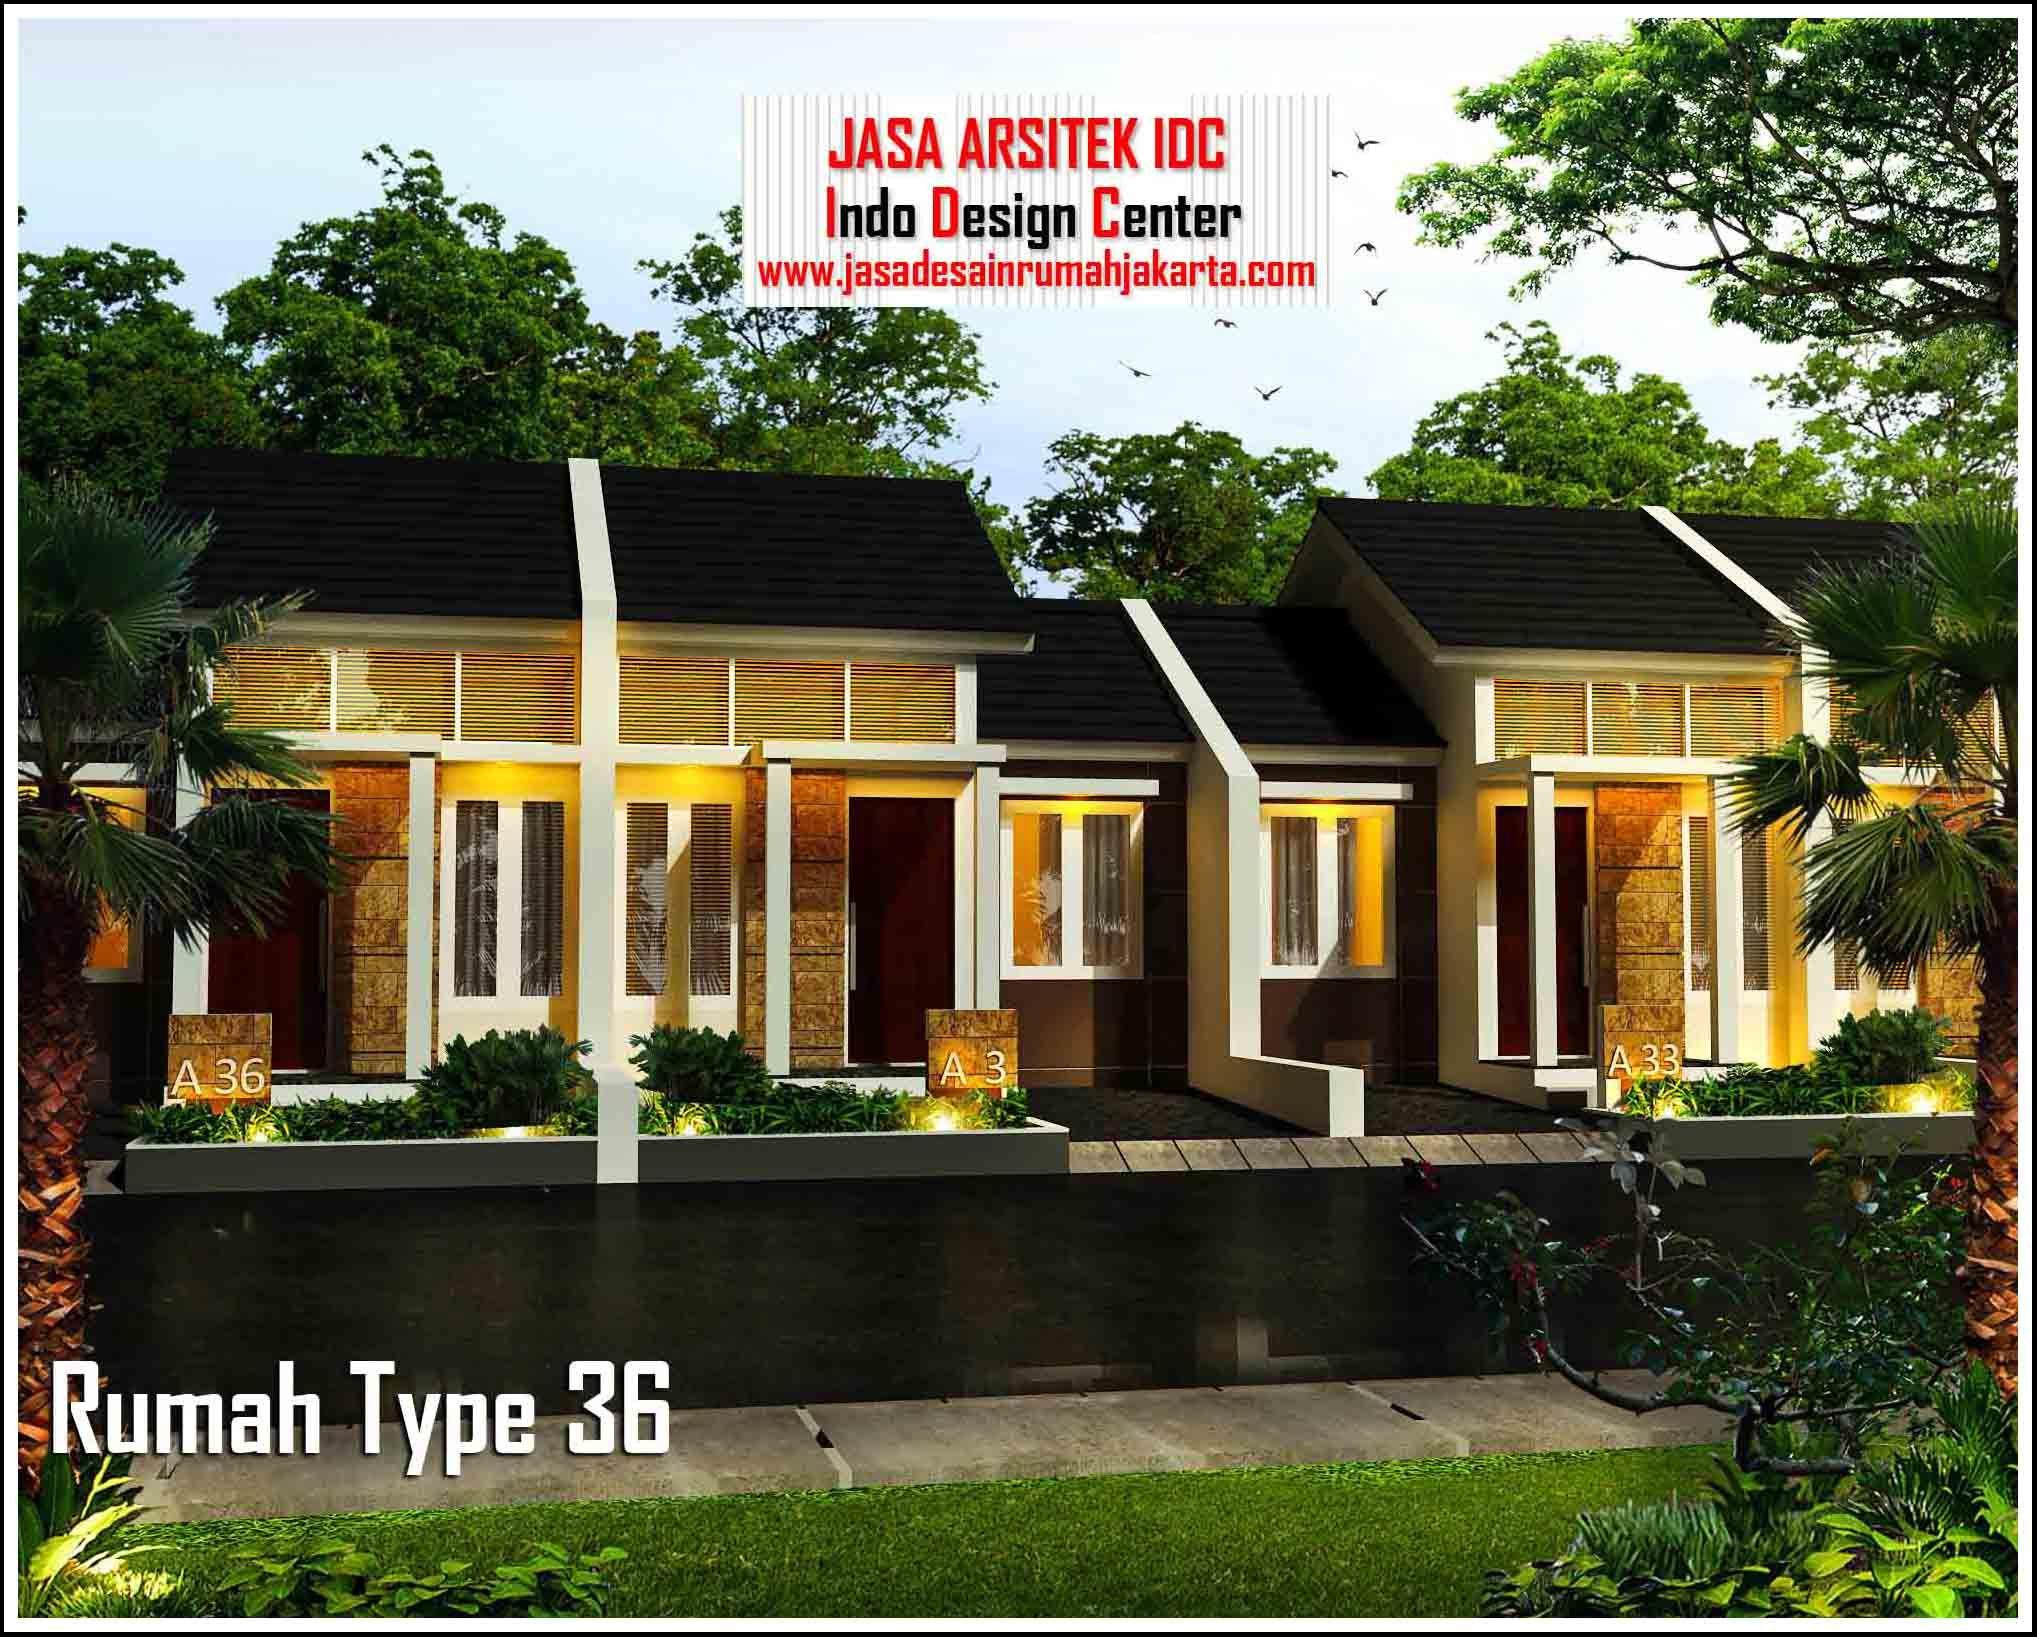 35 Tampak Depan Rumah Minimalis Type 36/72 | Typehom